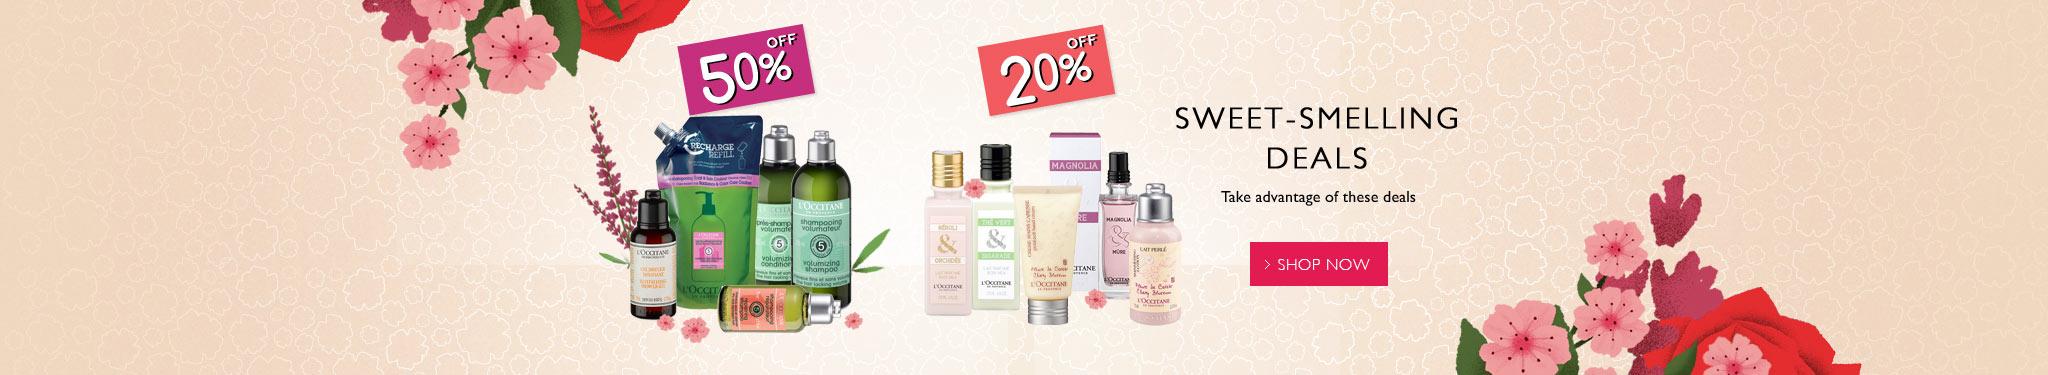 Sweet-smelling Deals